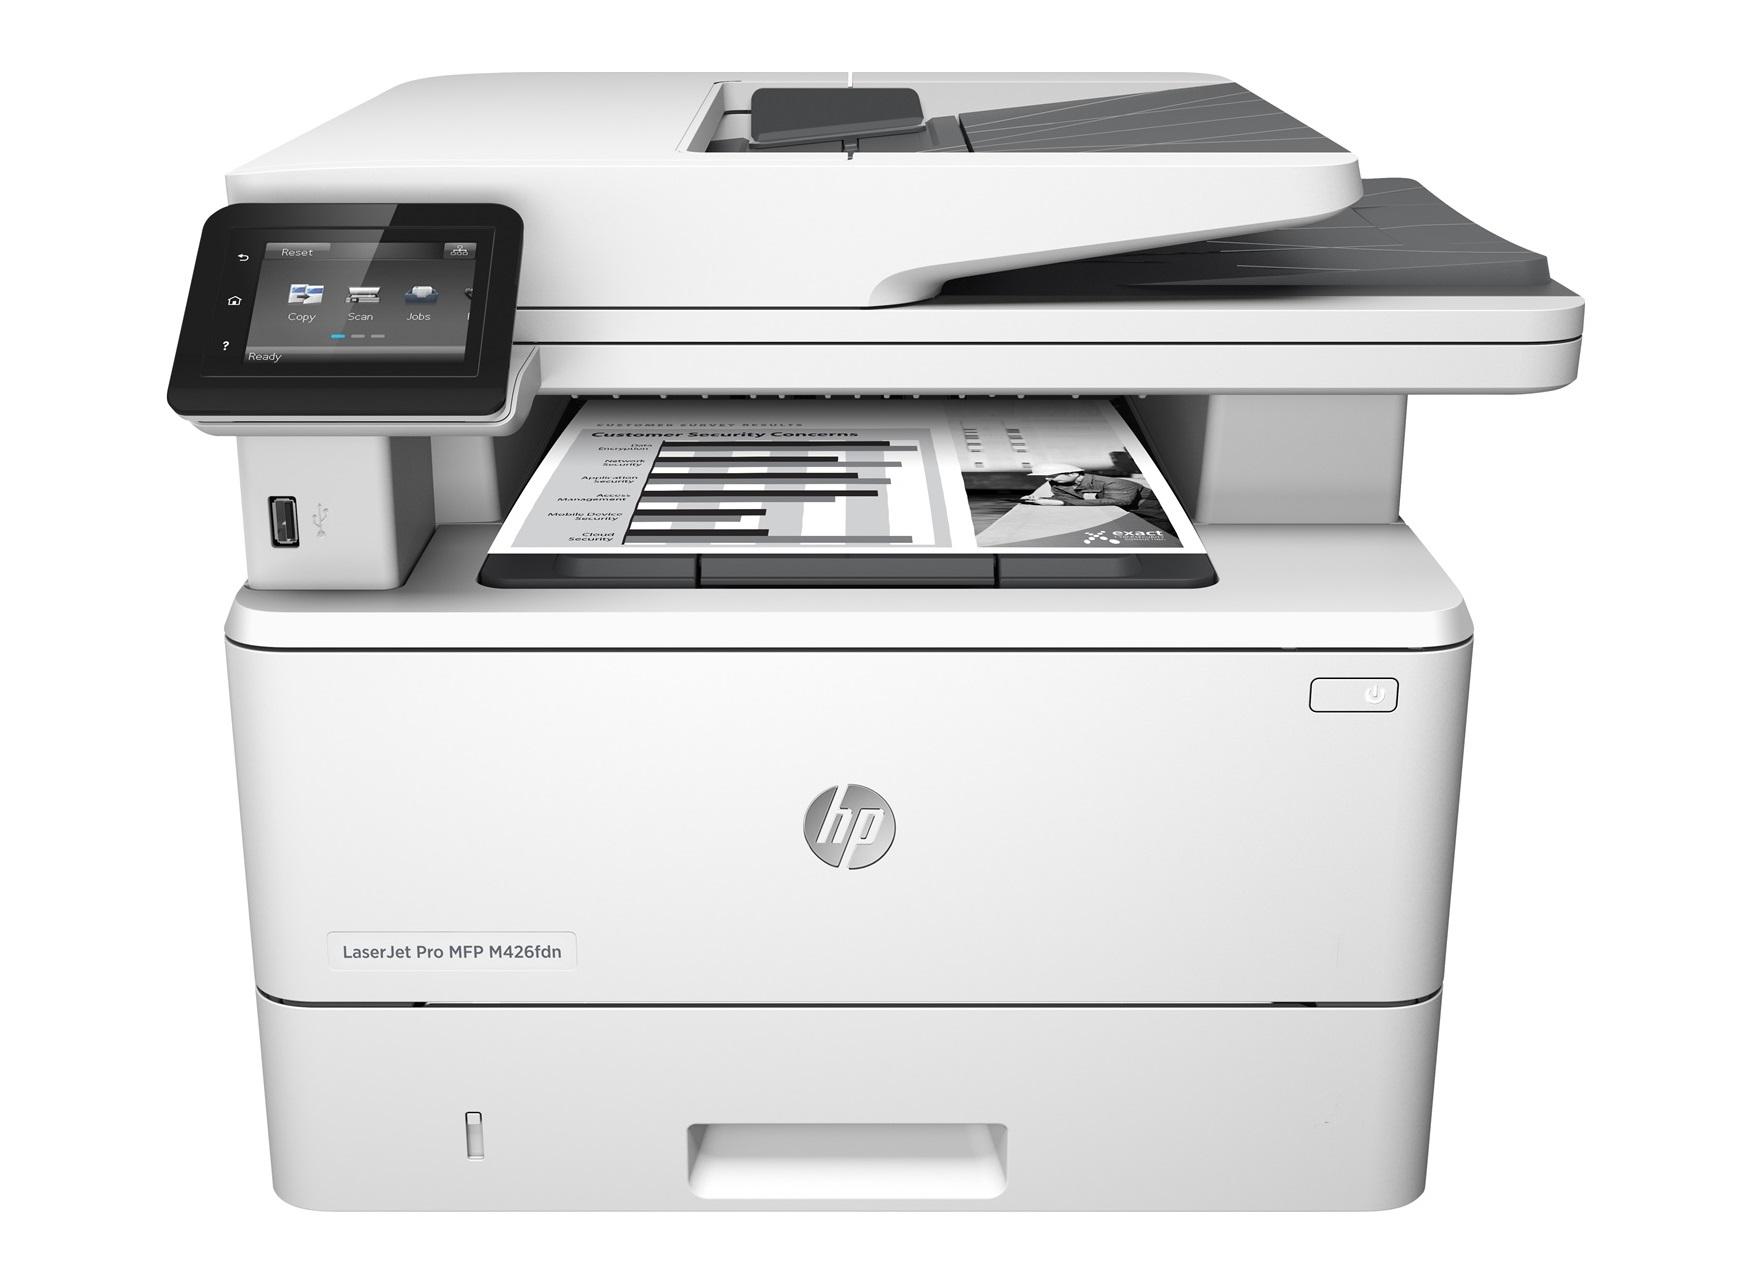 HP LaserJet Pro MFP M426fdn (38str/min, A4, USB/Ethernet, PRINT/SCAN/COPY, FAX, duplex)